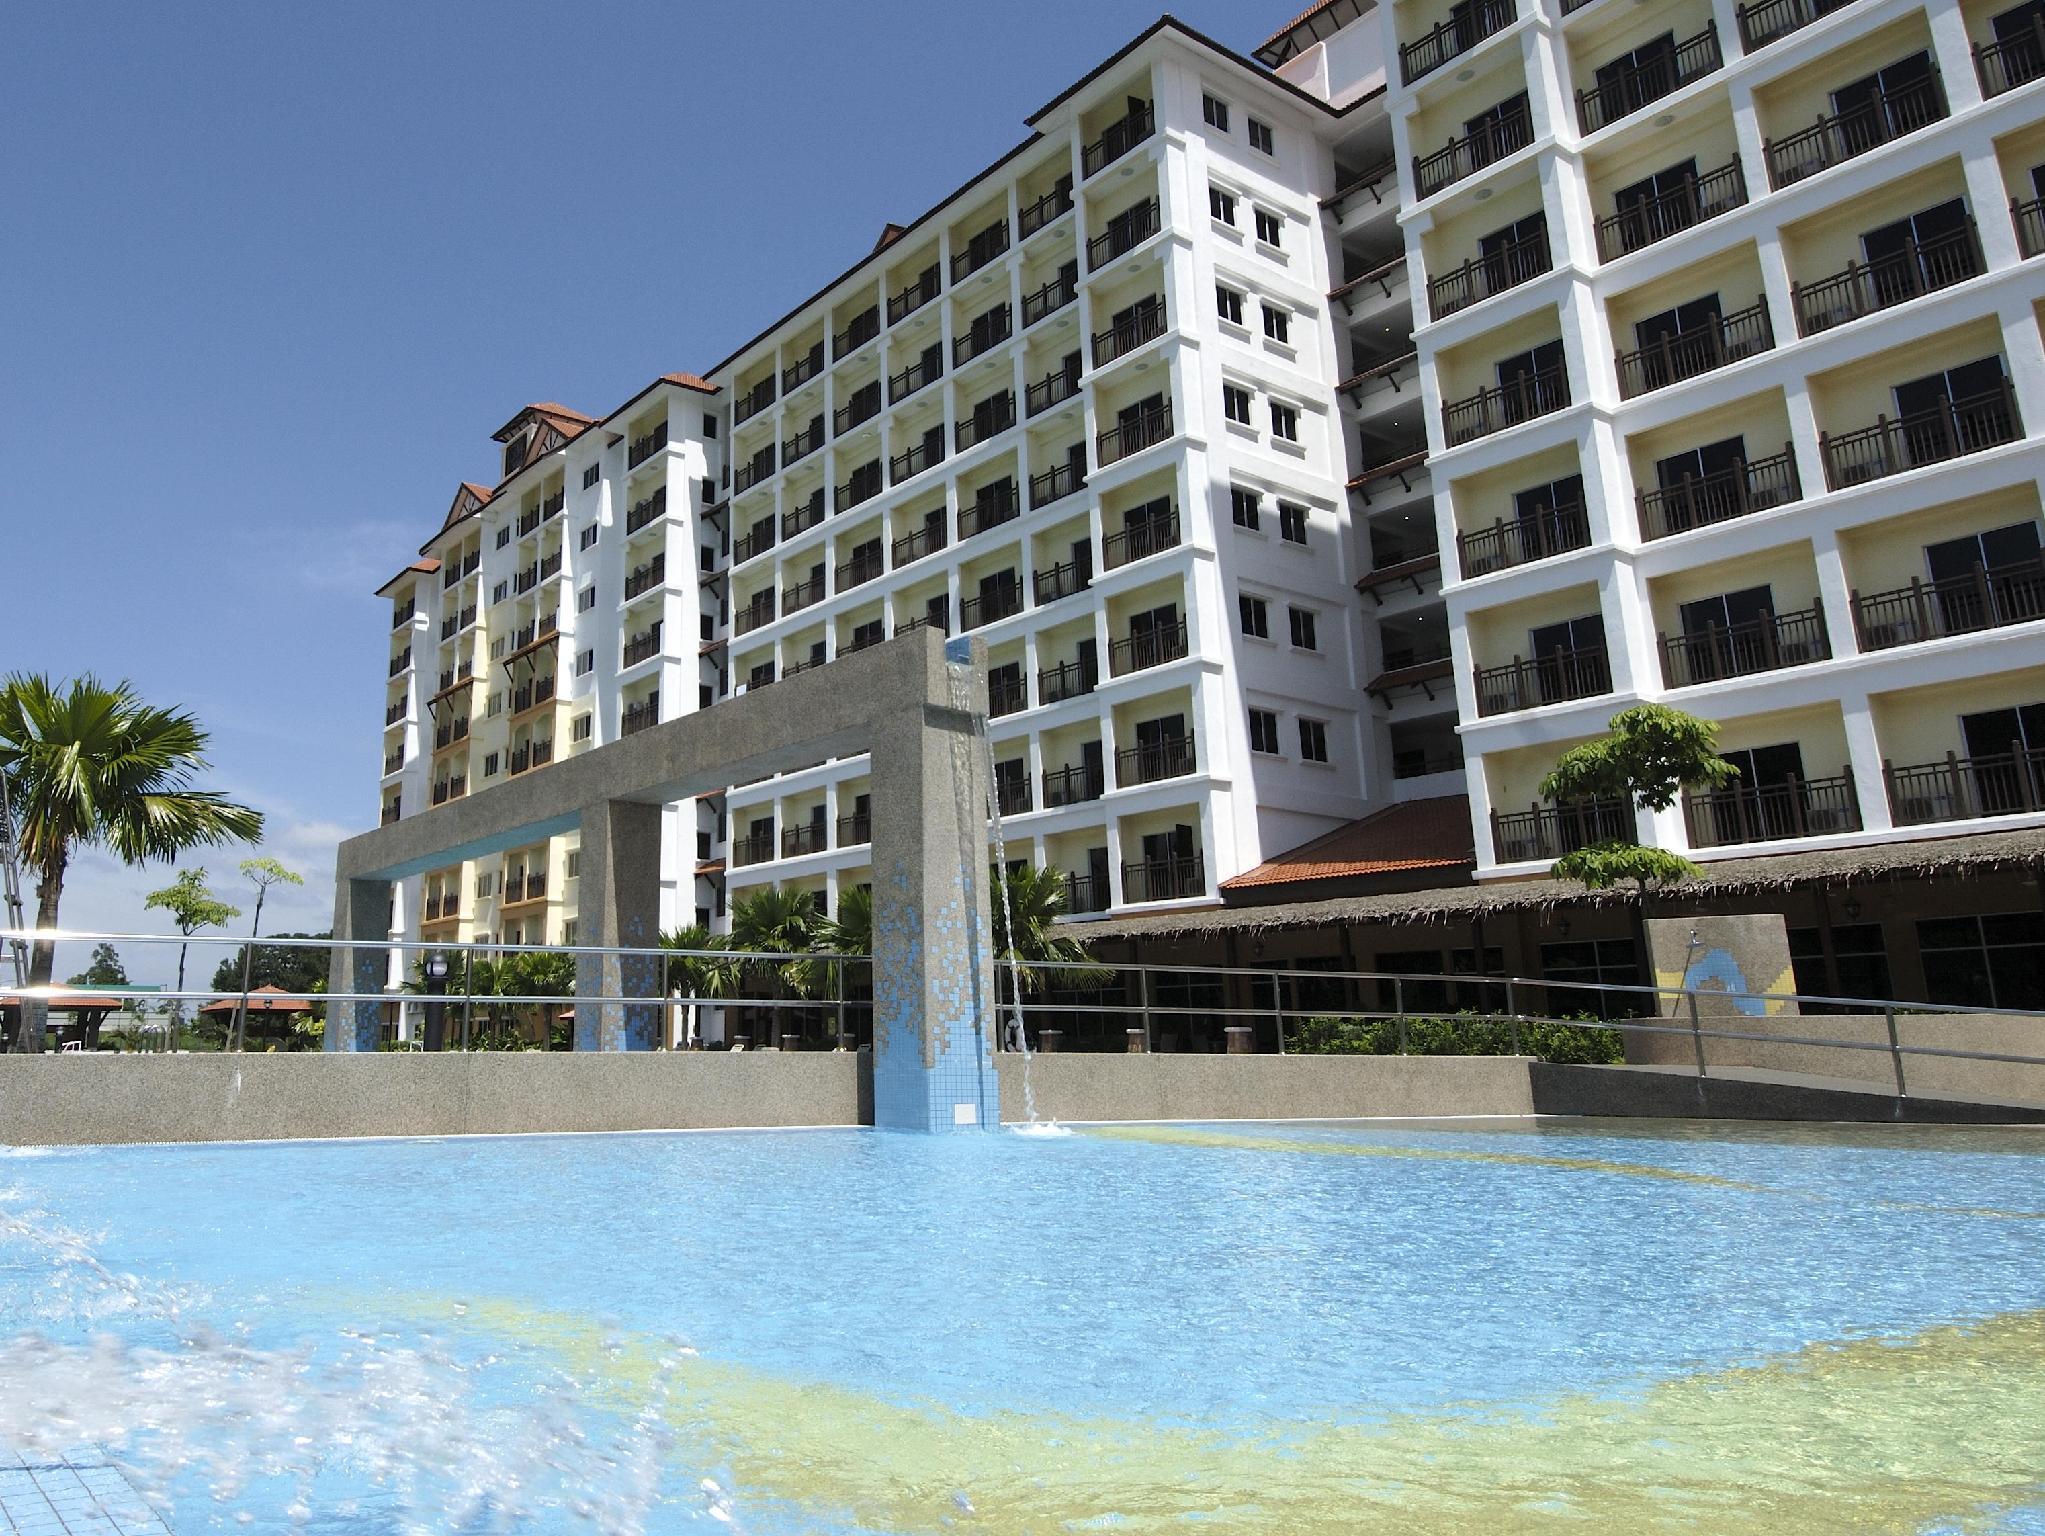 Suria Service Apartment Bukit Merah